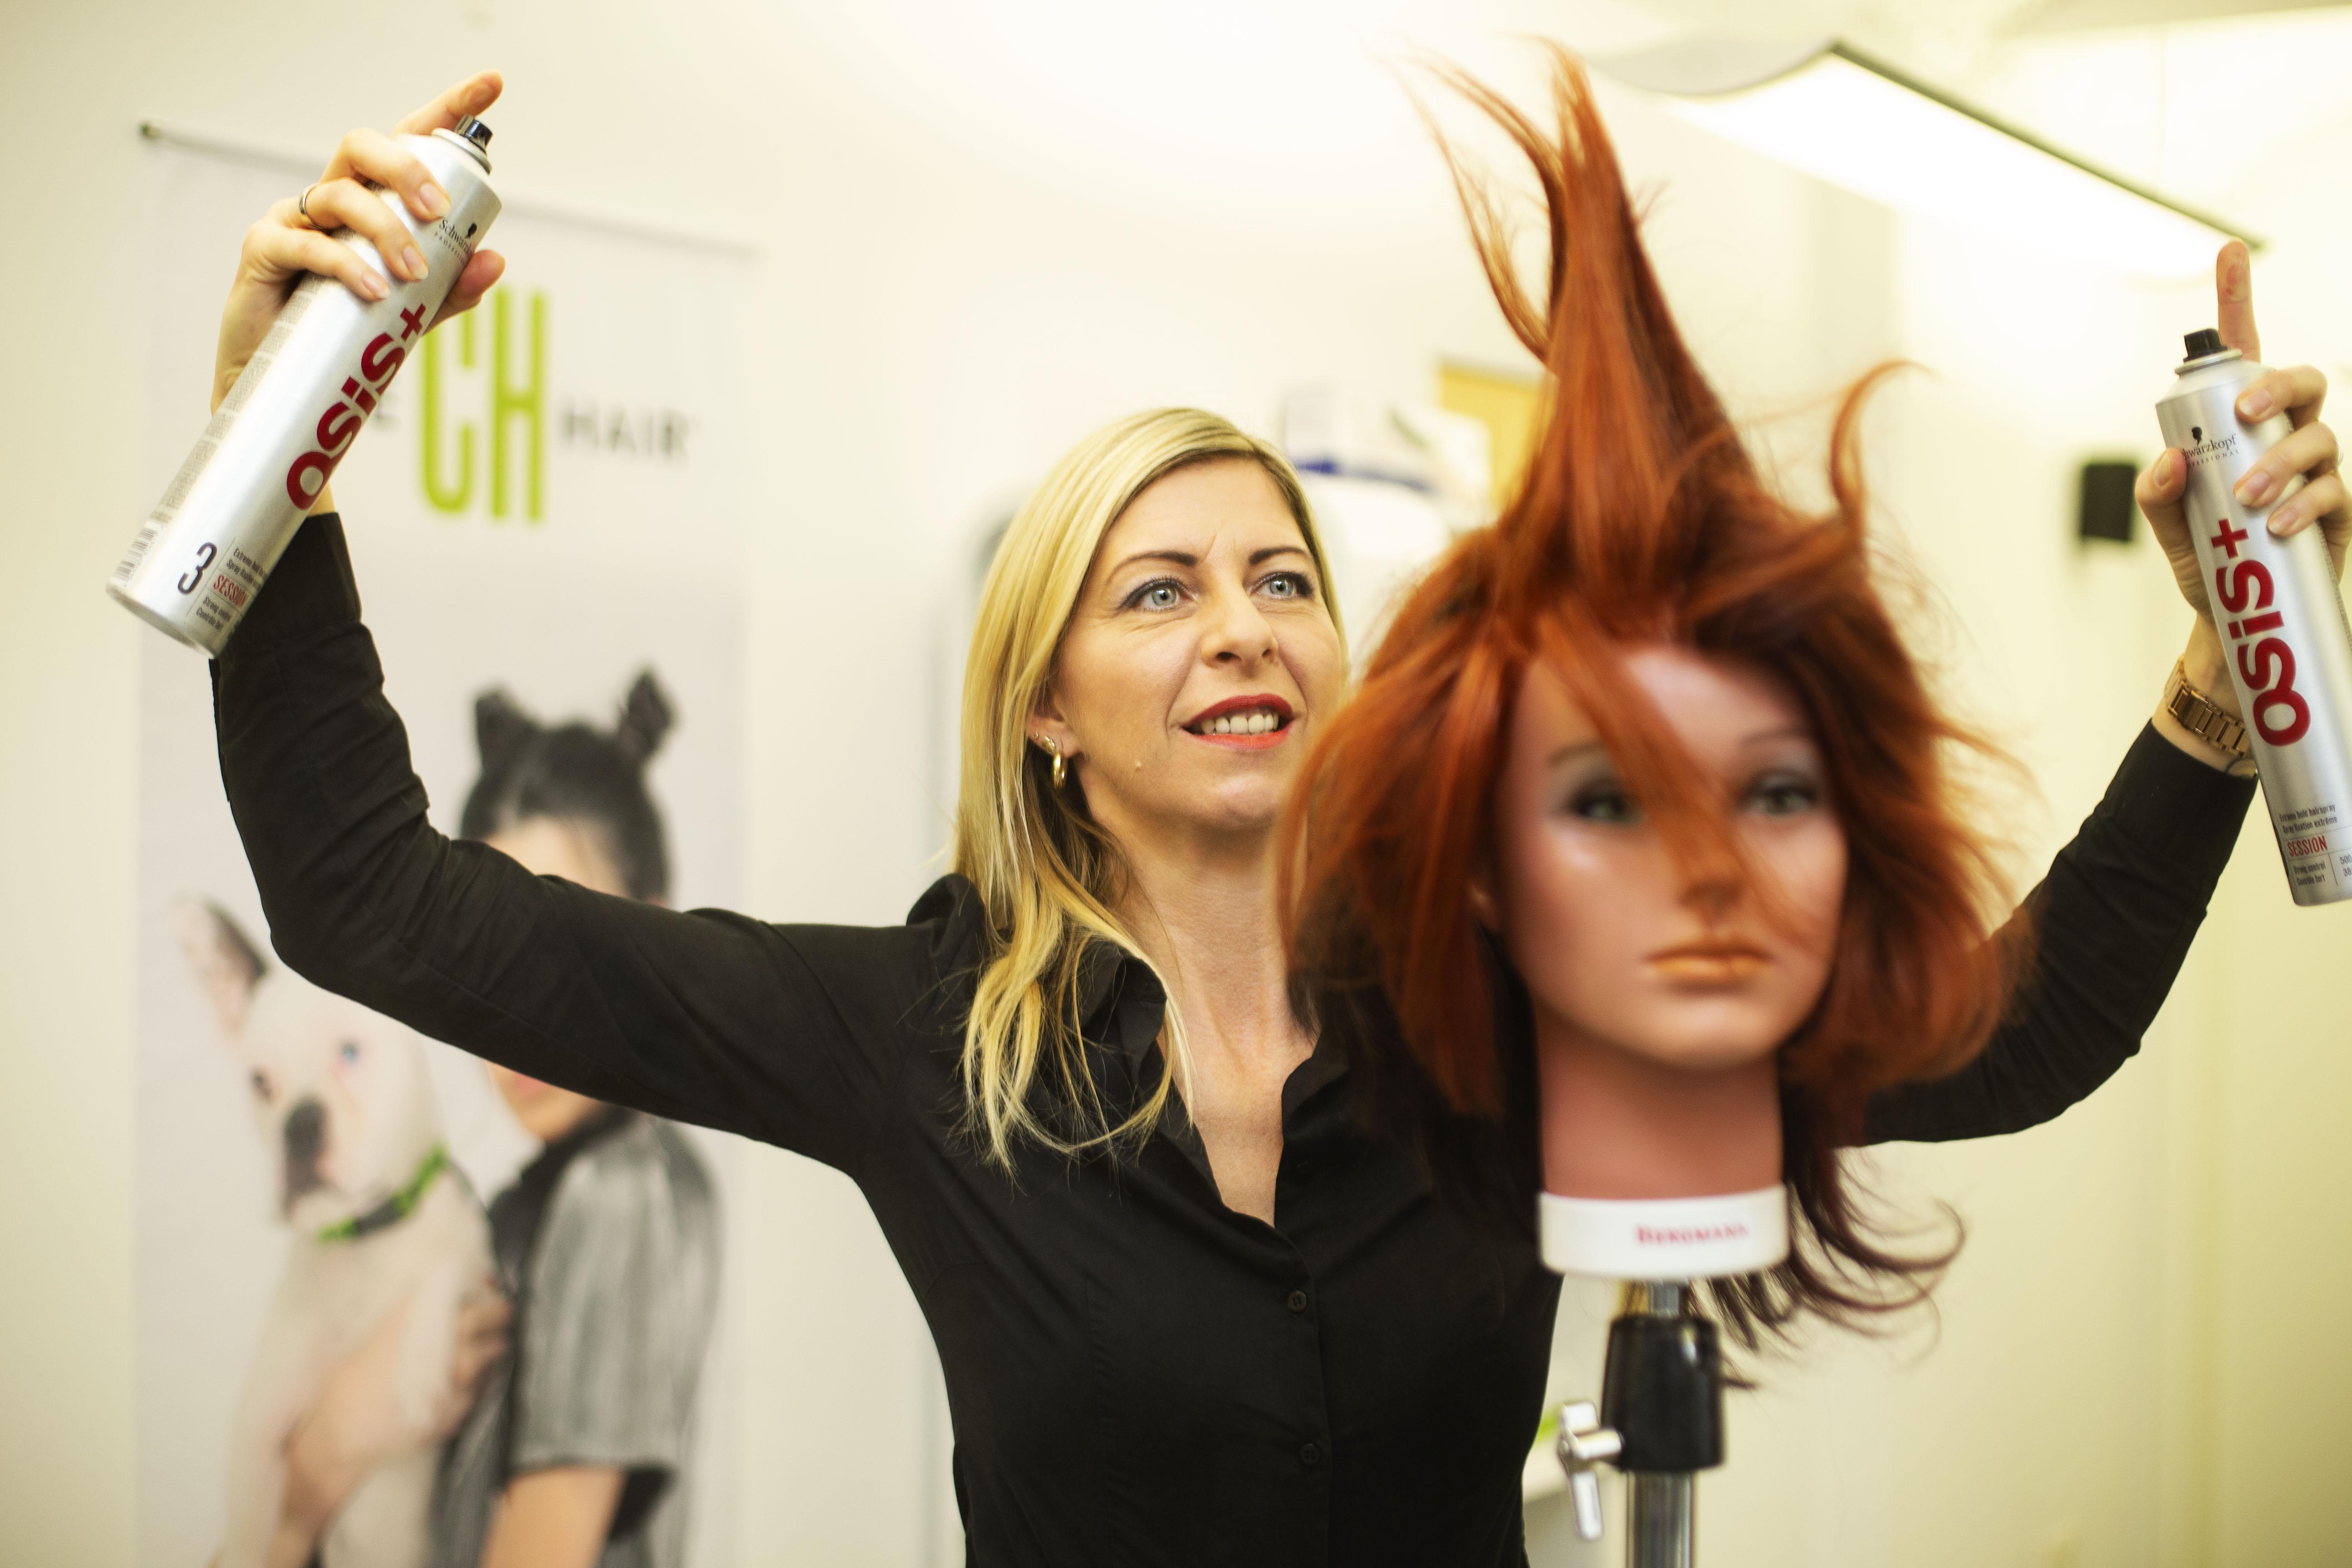 ✂ Friseur-Salon Budenbergstraße, Magdeburg  Ypsilon Hairstyle